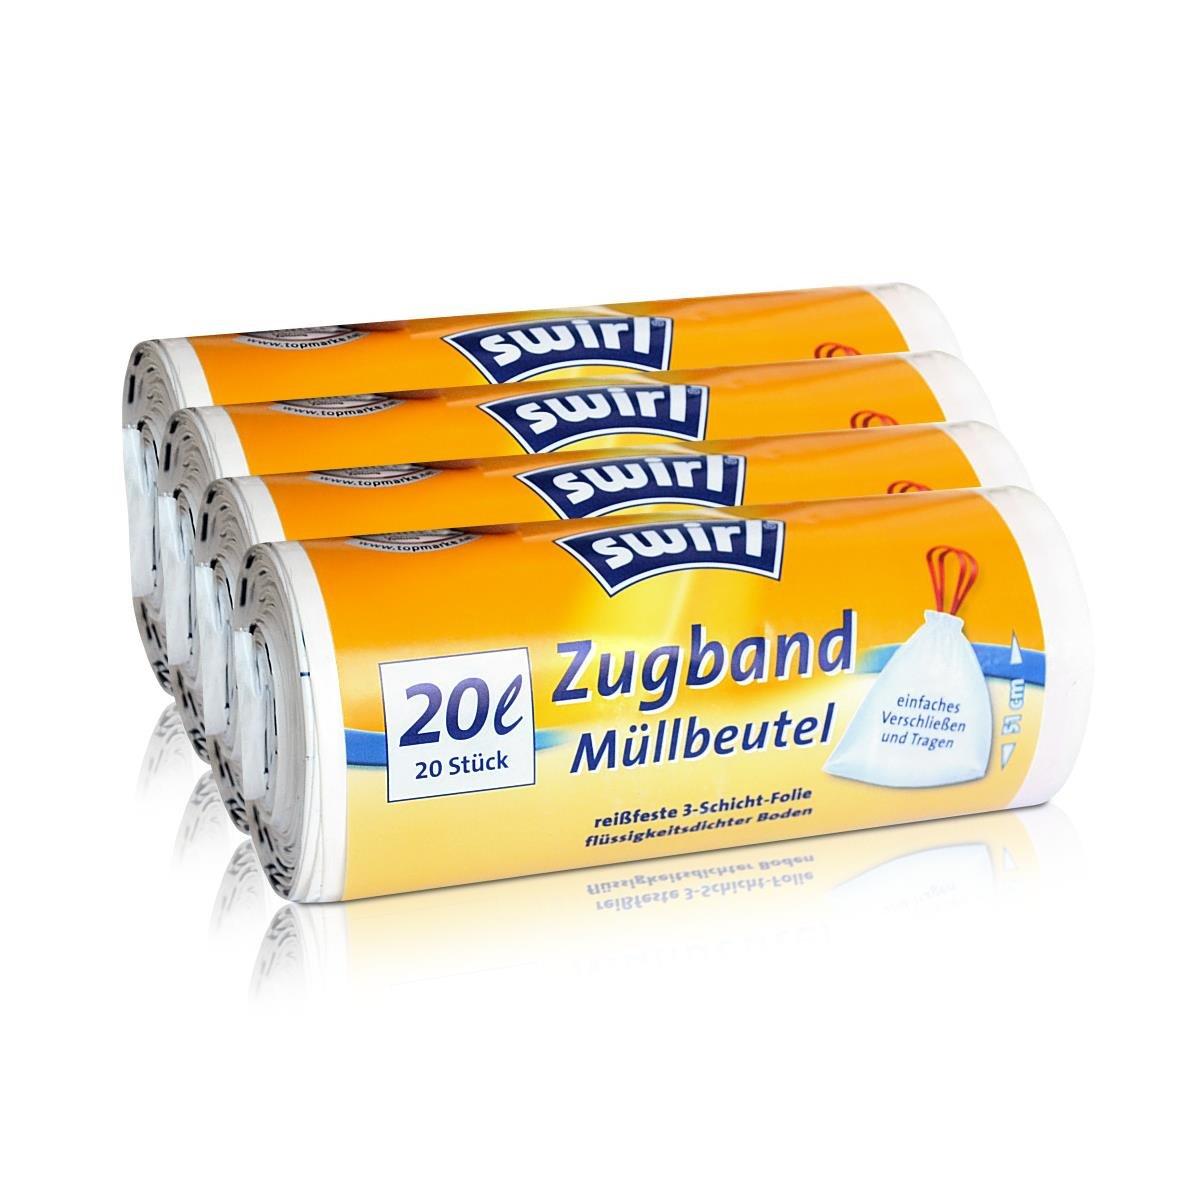 Pack of 20//Roll 4x swirl Drawstring Bin Liners 20/Litre